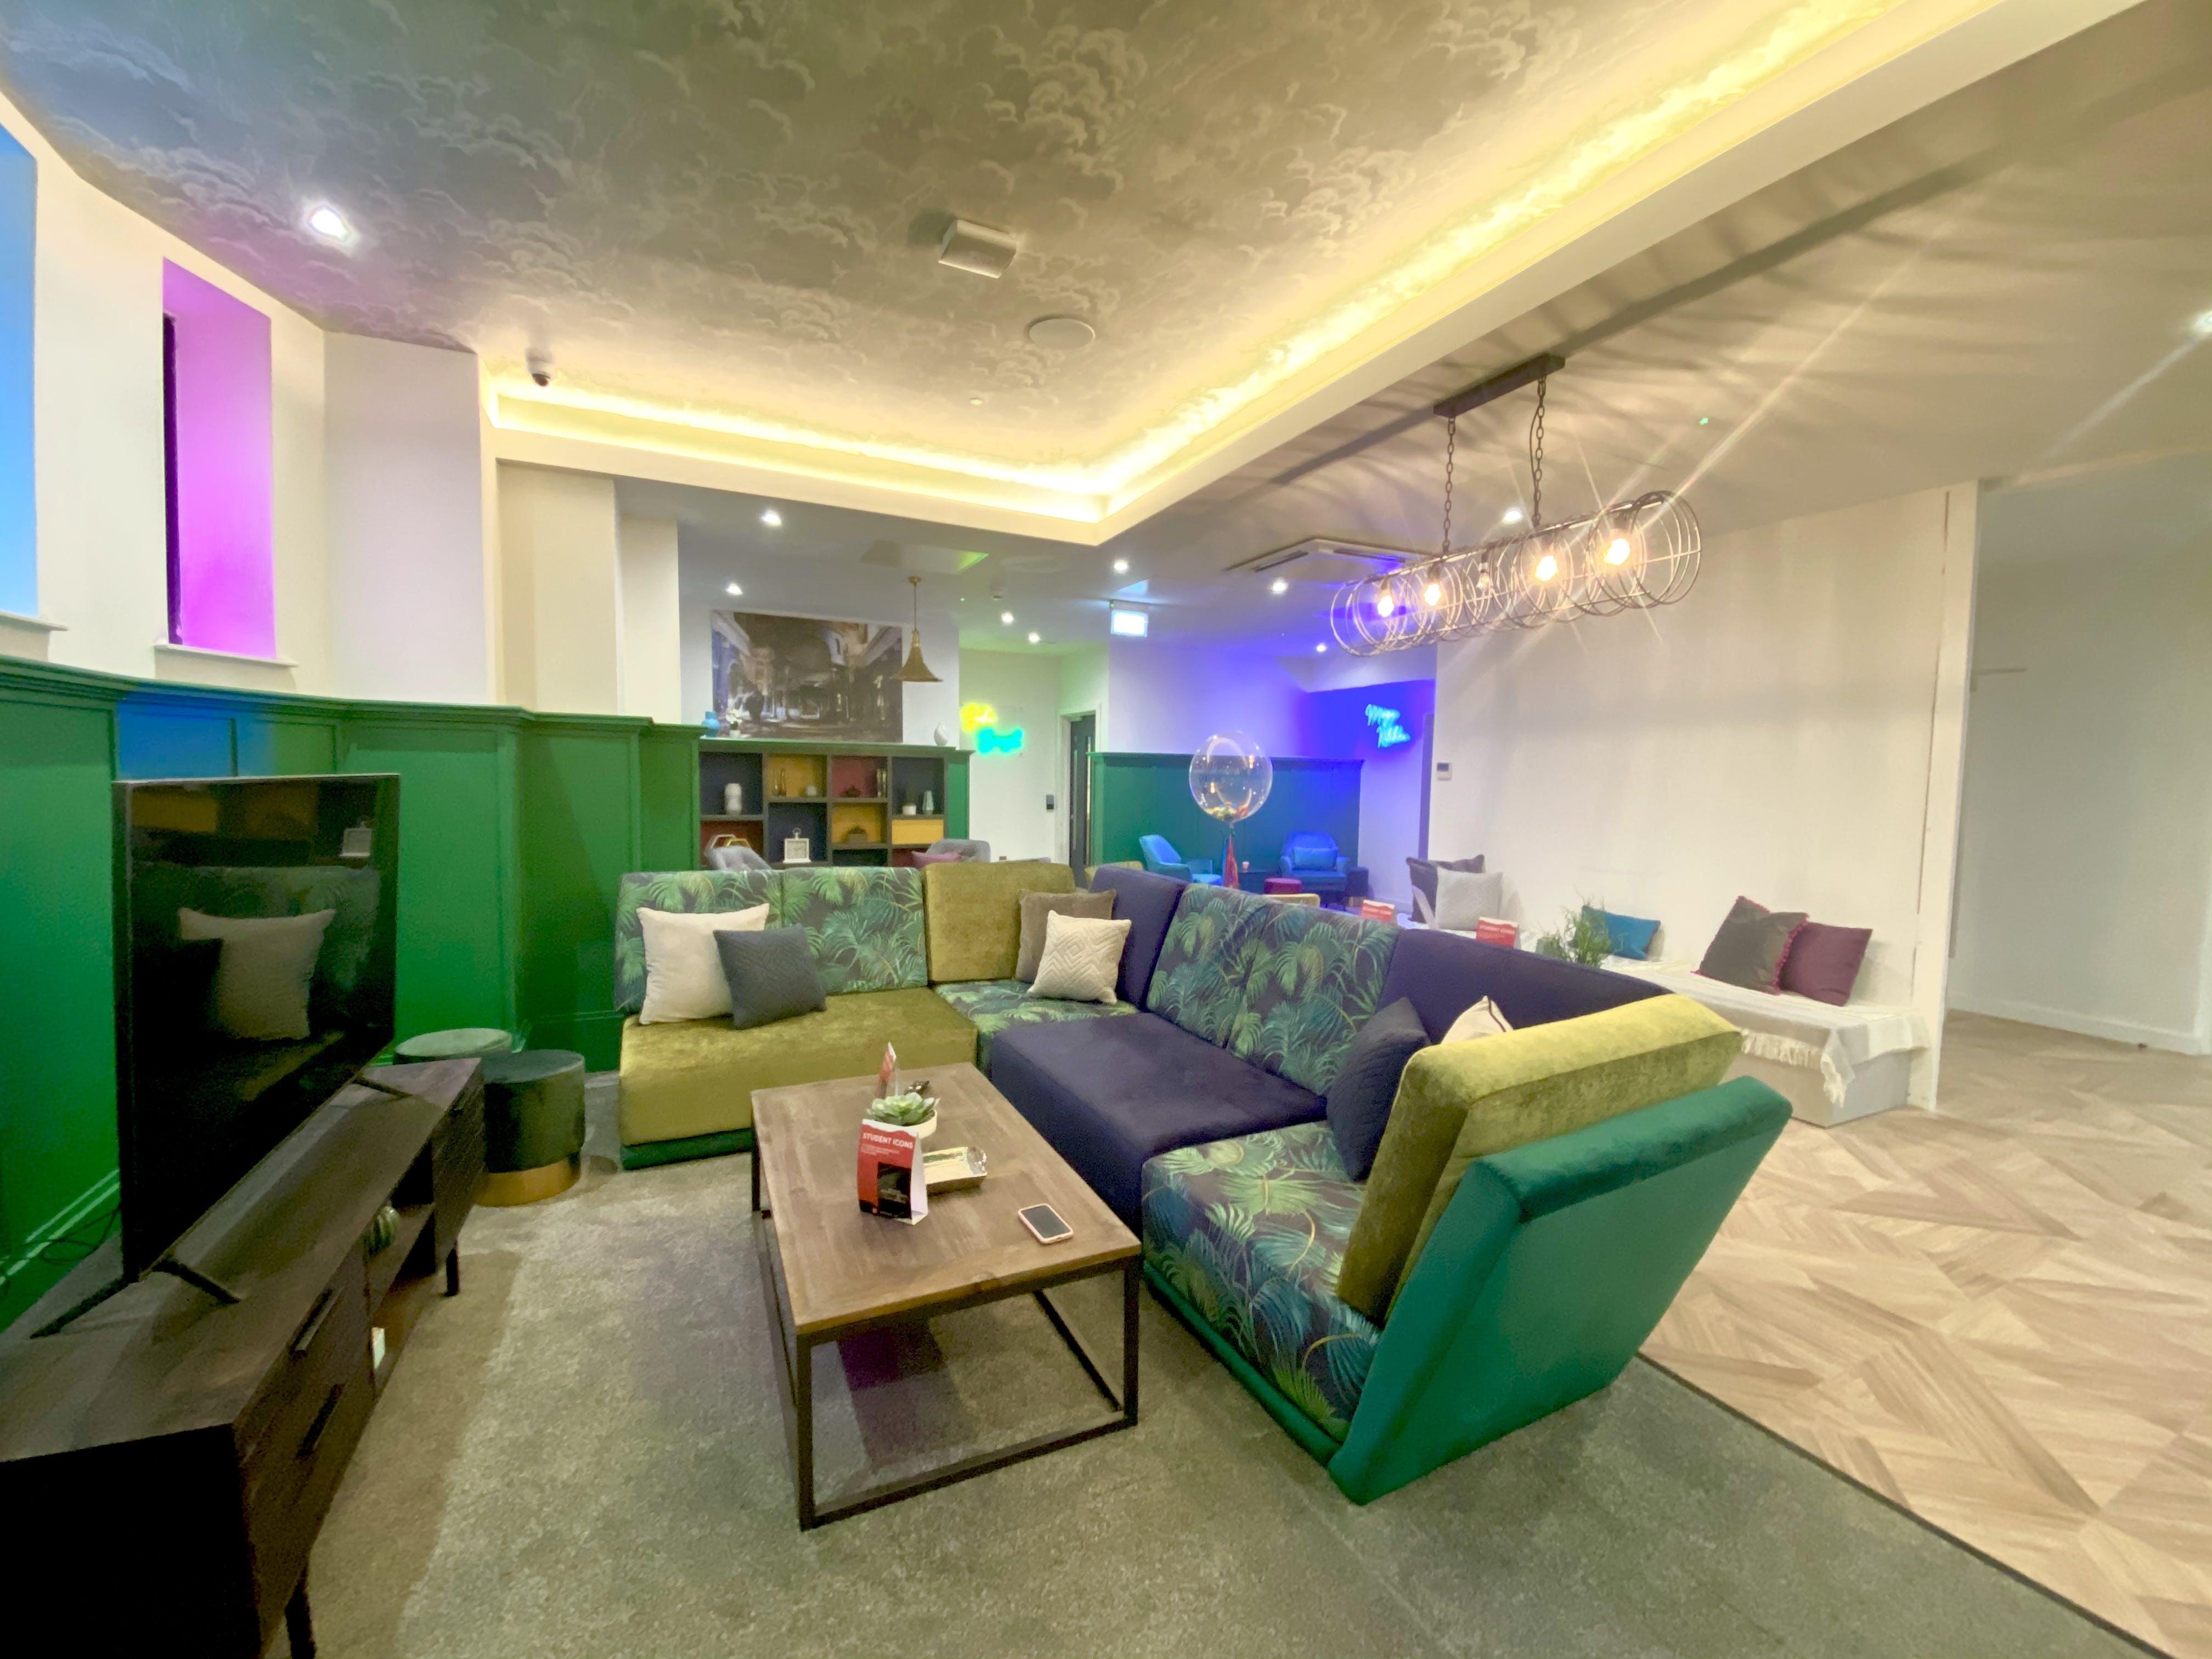 Upscale Residence w/ Coworking + Cinema Room + Gym